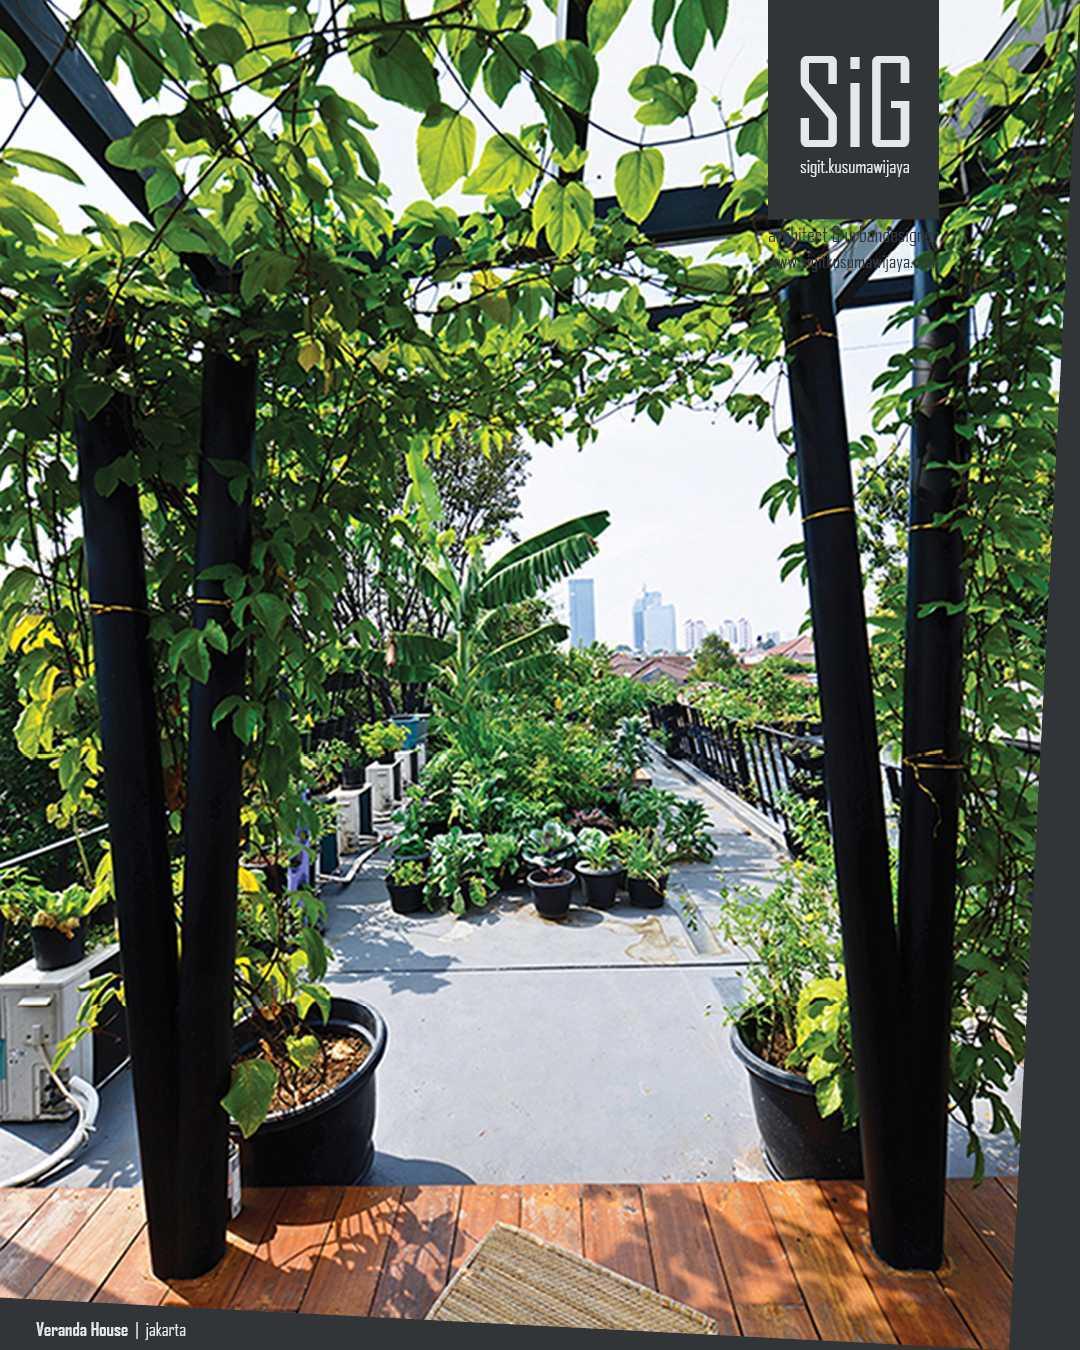 Sigit.kusumawijaya | Architect & Urbandesigner Rumah Beranda - Green Boarding House Cipete, South Jakarta, Indonesia Cipete, South Jakarta, Indonesia Sigitkusumawijaya-Architect-Urbandesigner-Rumah-Beranda-Green-Boarding-House Tropis 55010